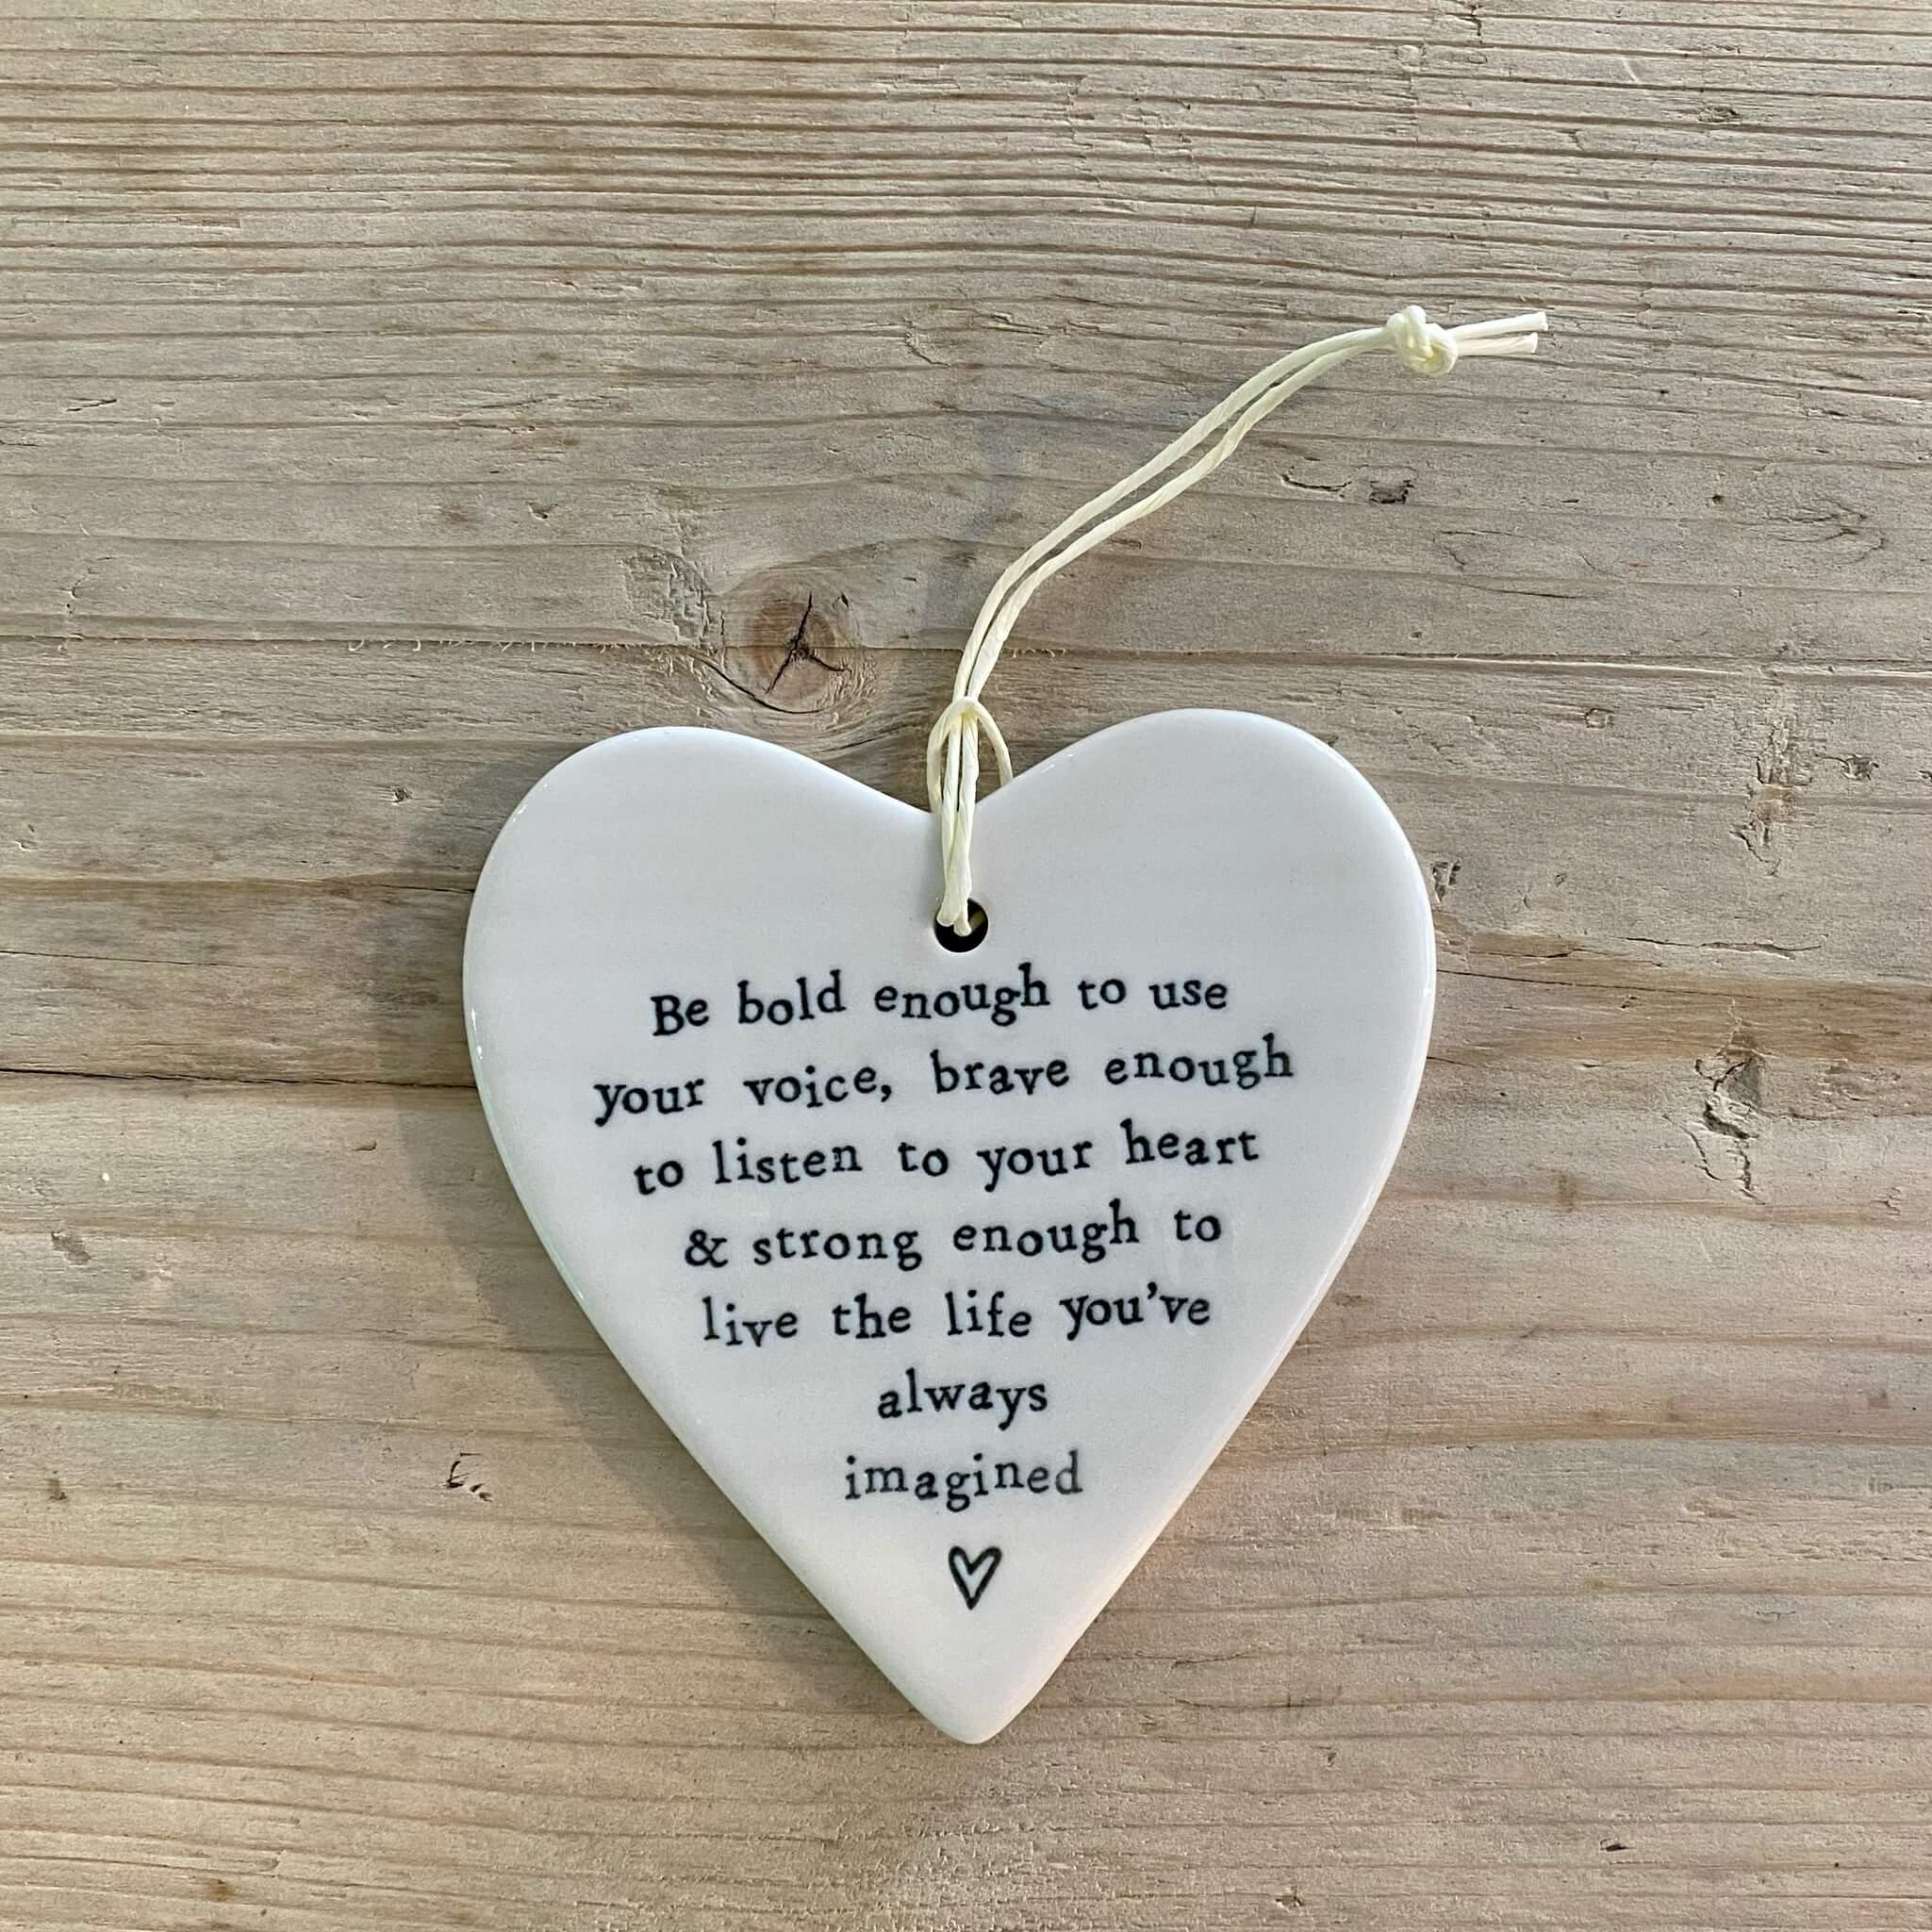 Porcelain Heart - Be bold enough